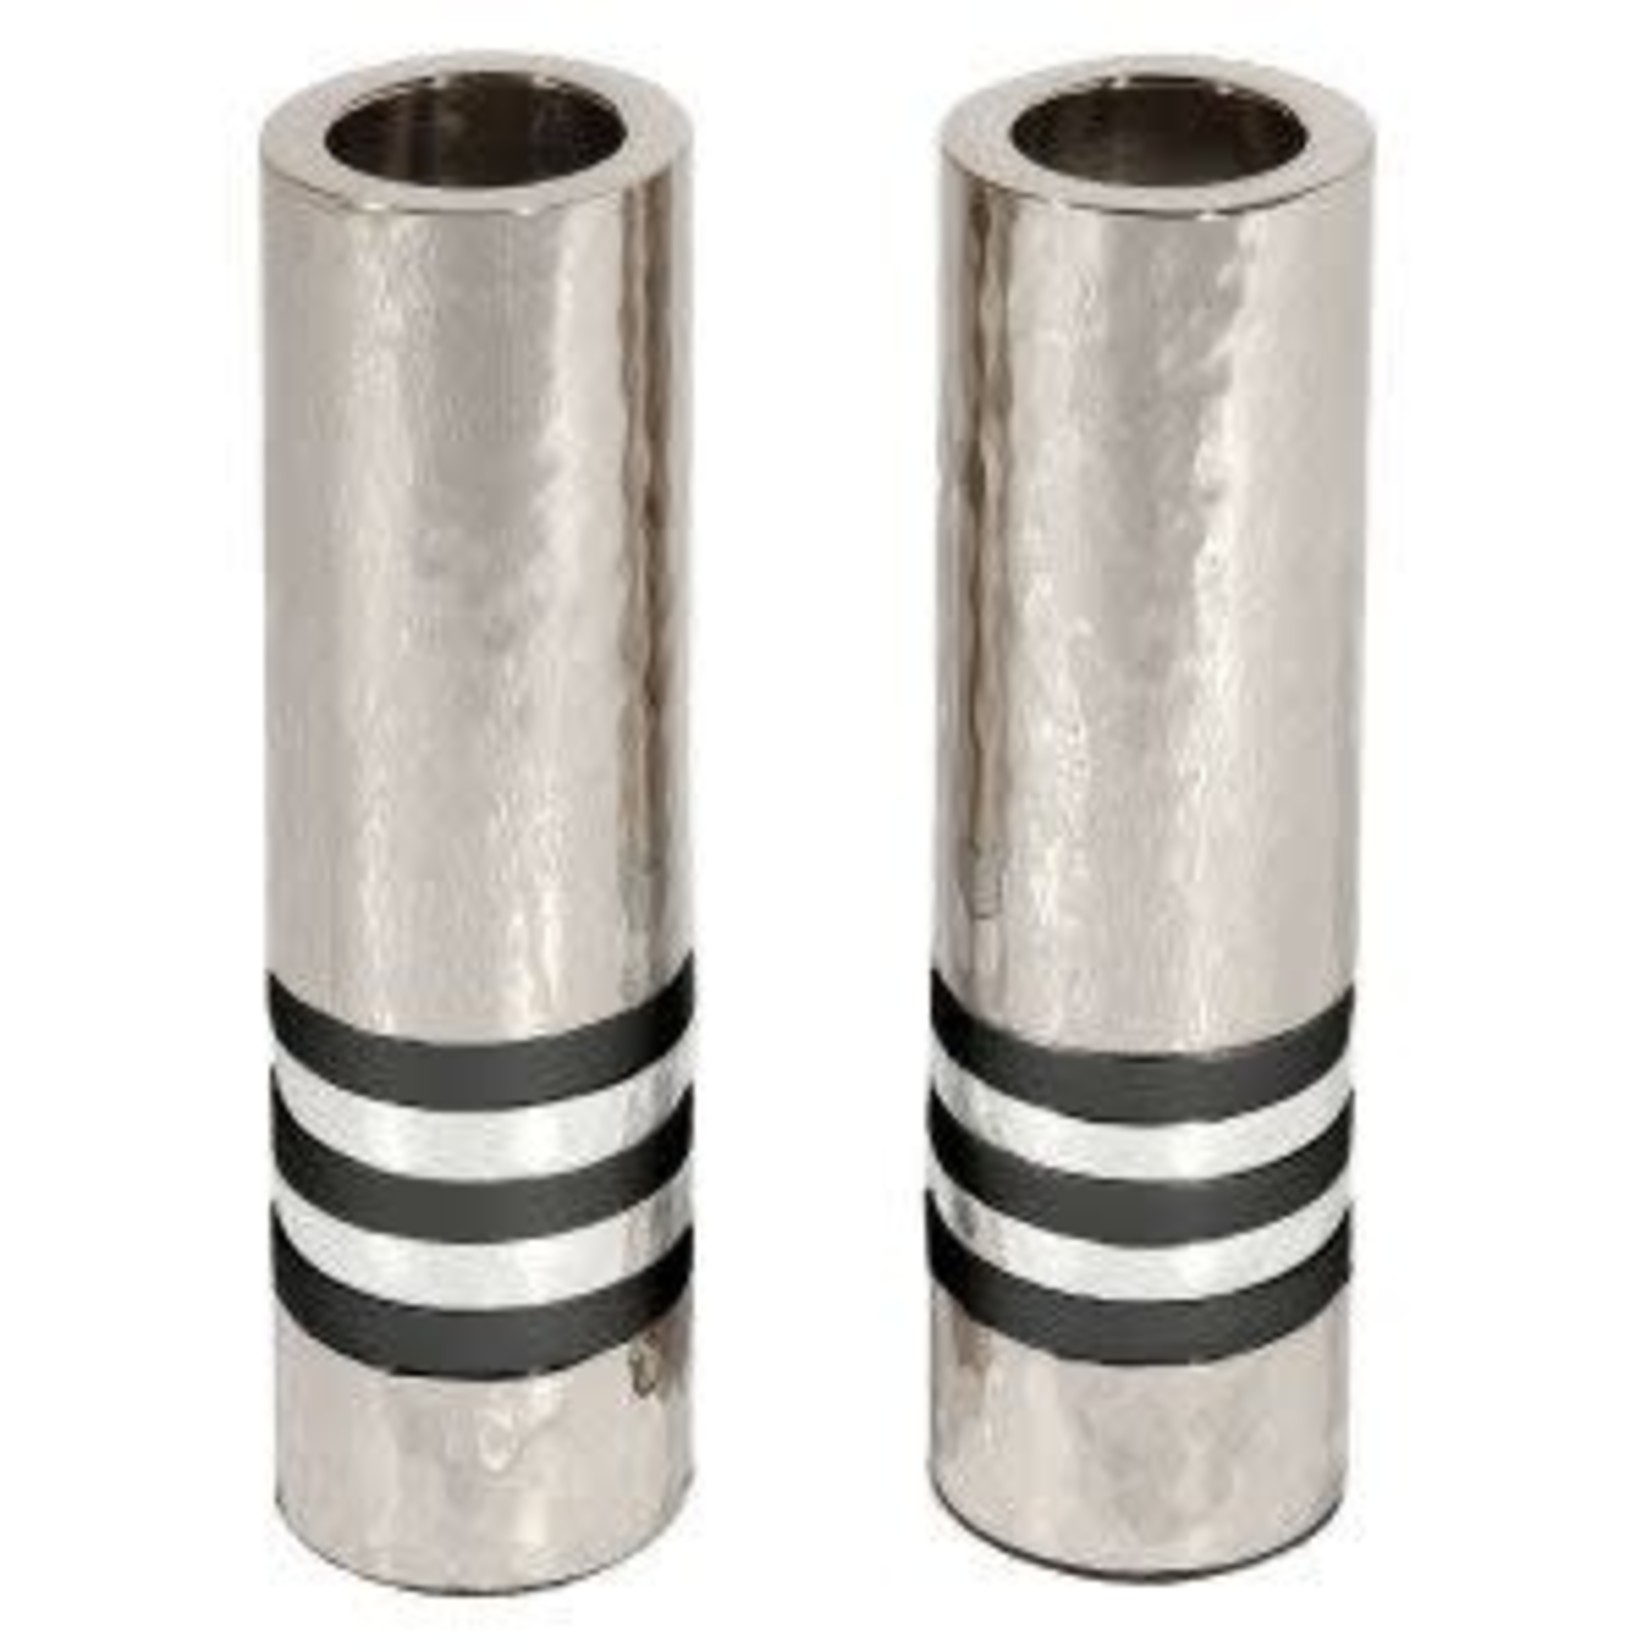 Yair Emanuel Candlesticks, Aluminum